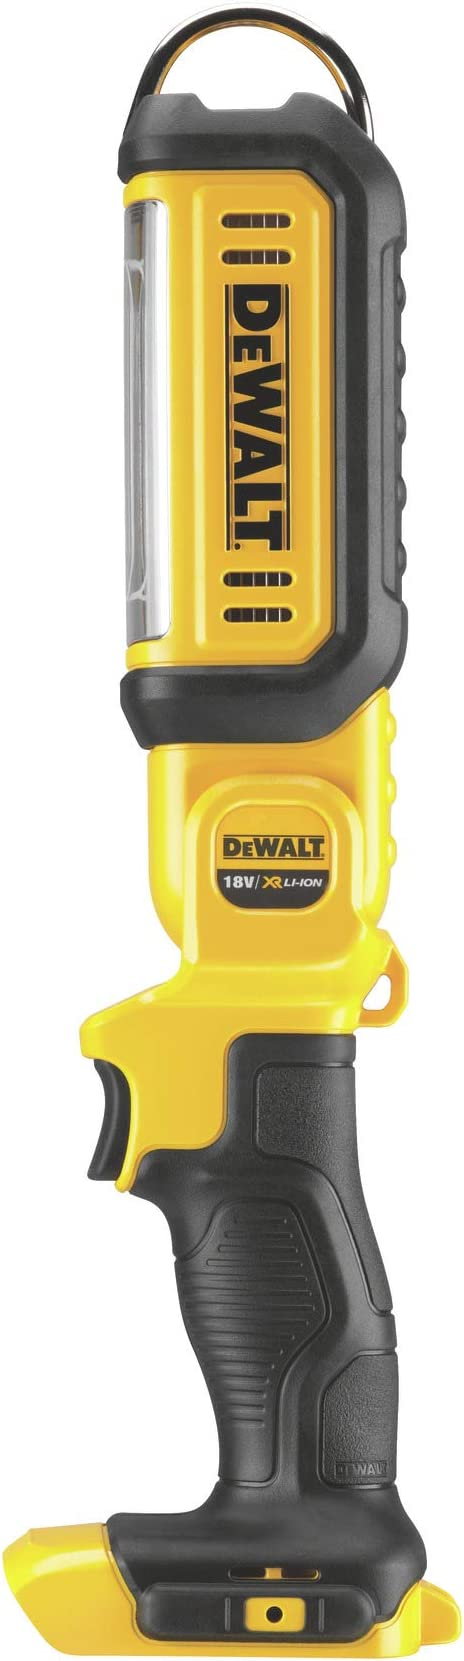 DeWALT DCL050 XJ Akku LED Lampe, Leuchte, Licht, Strahler 18